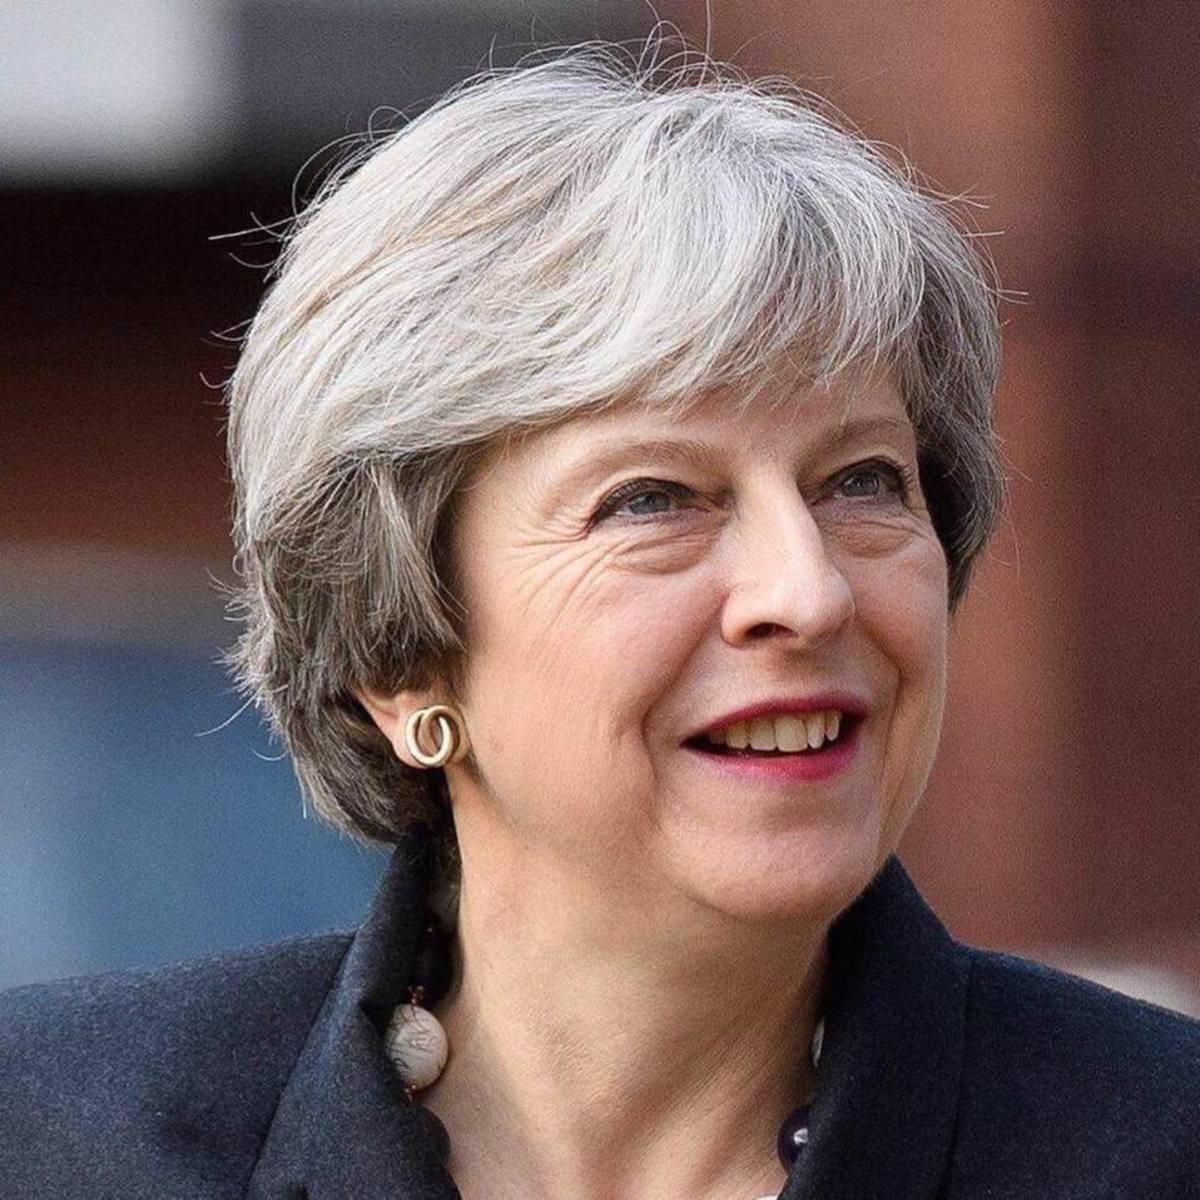 Boris joked with Theresa May during COVID 'Zoom' call,